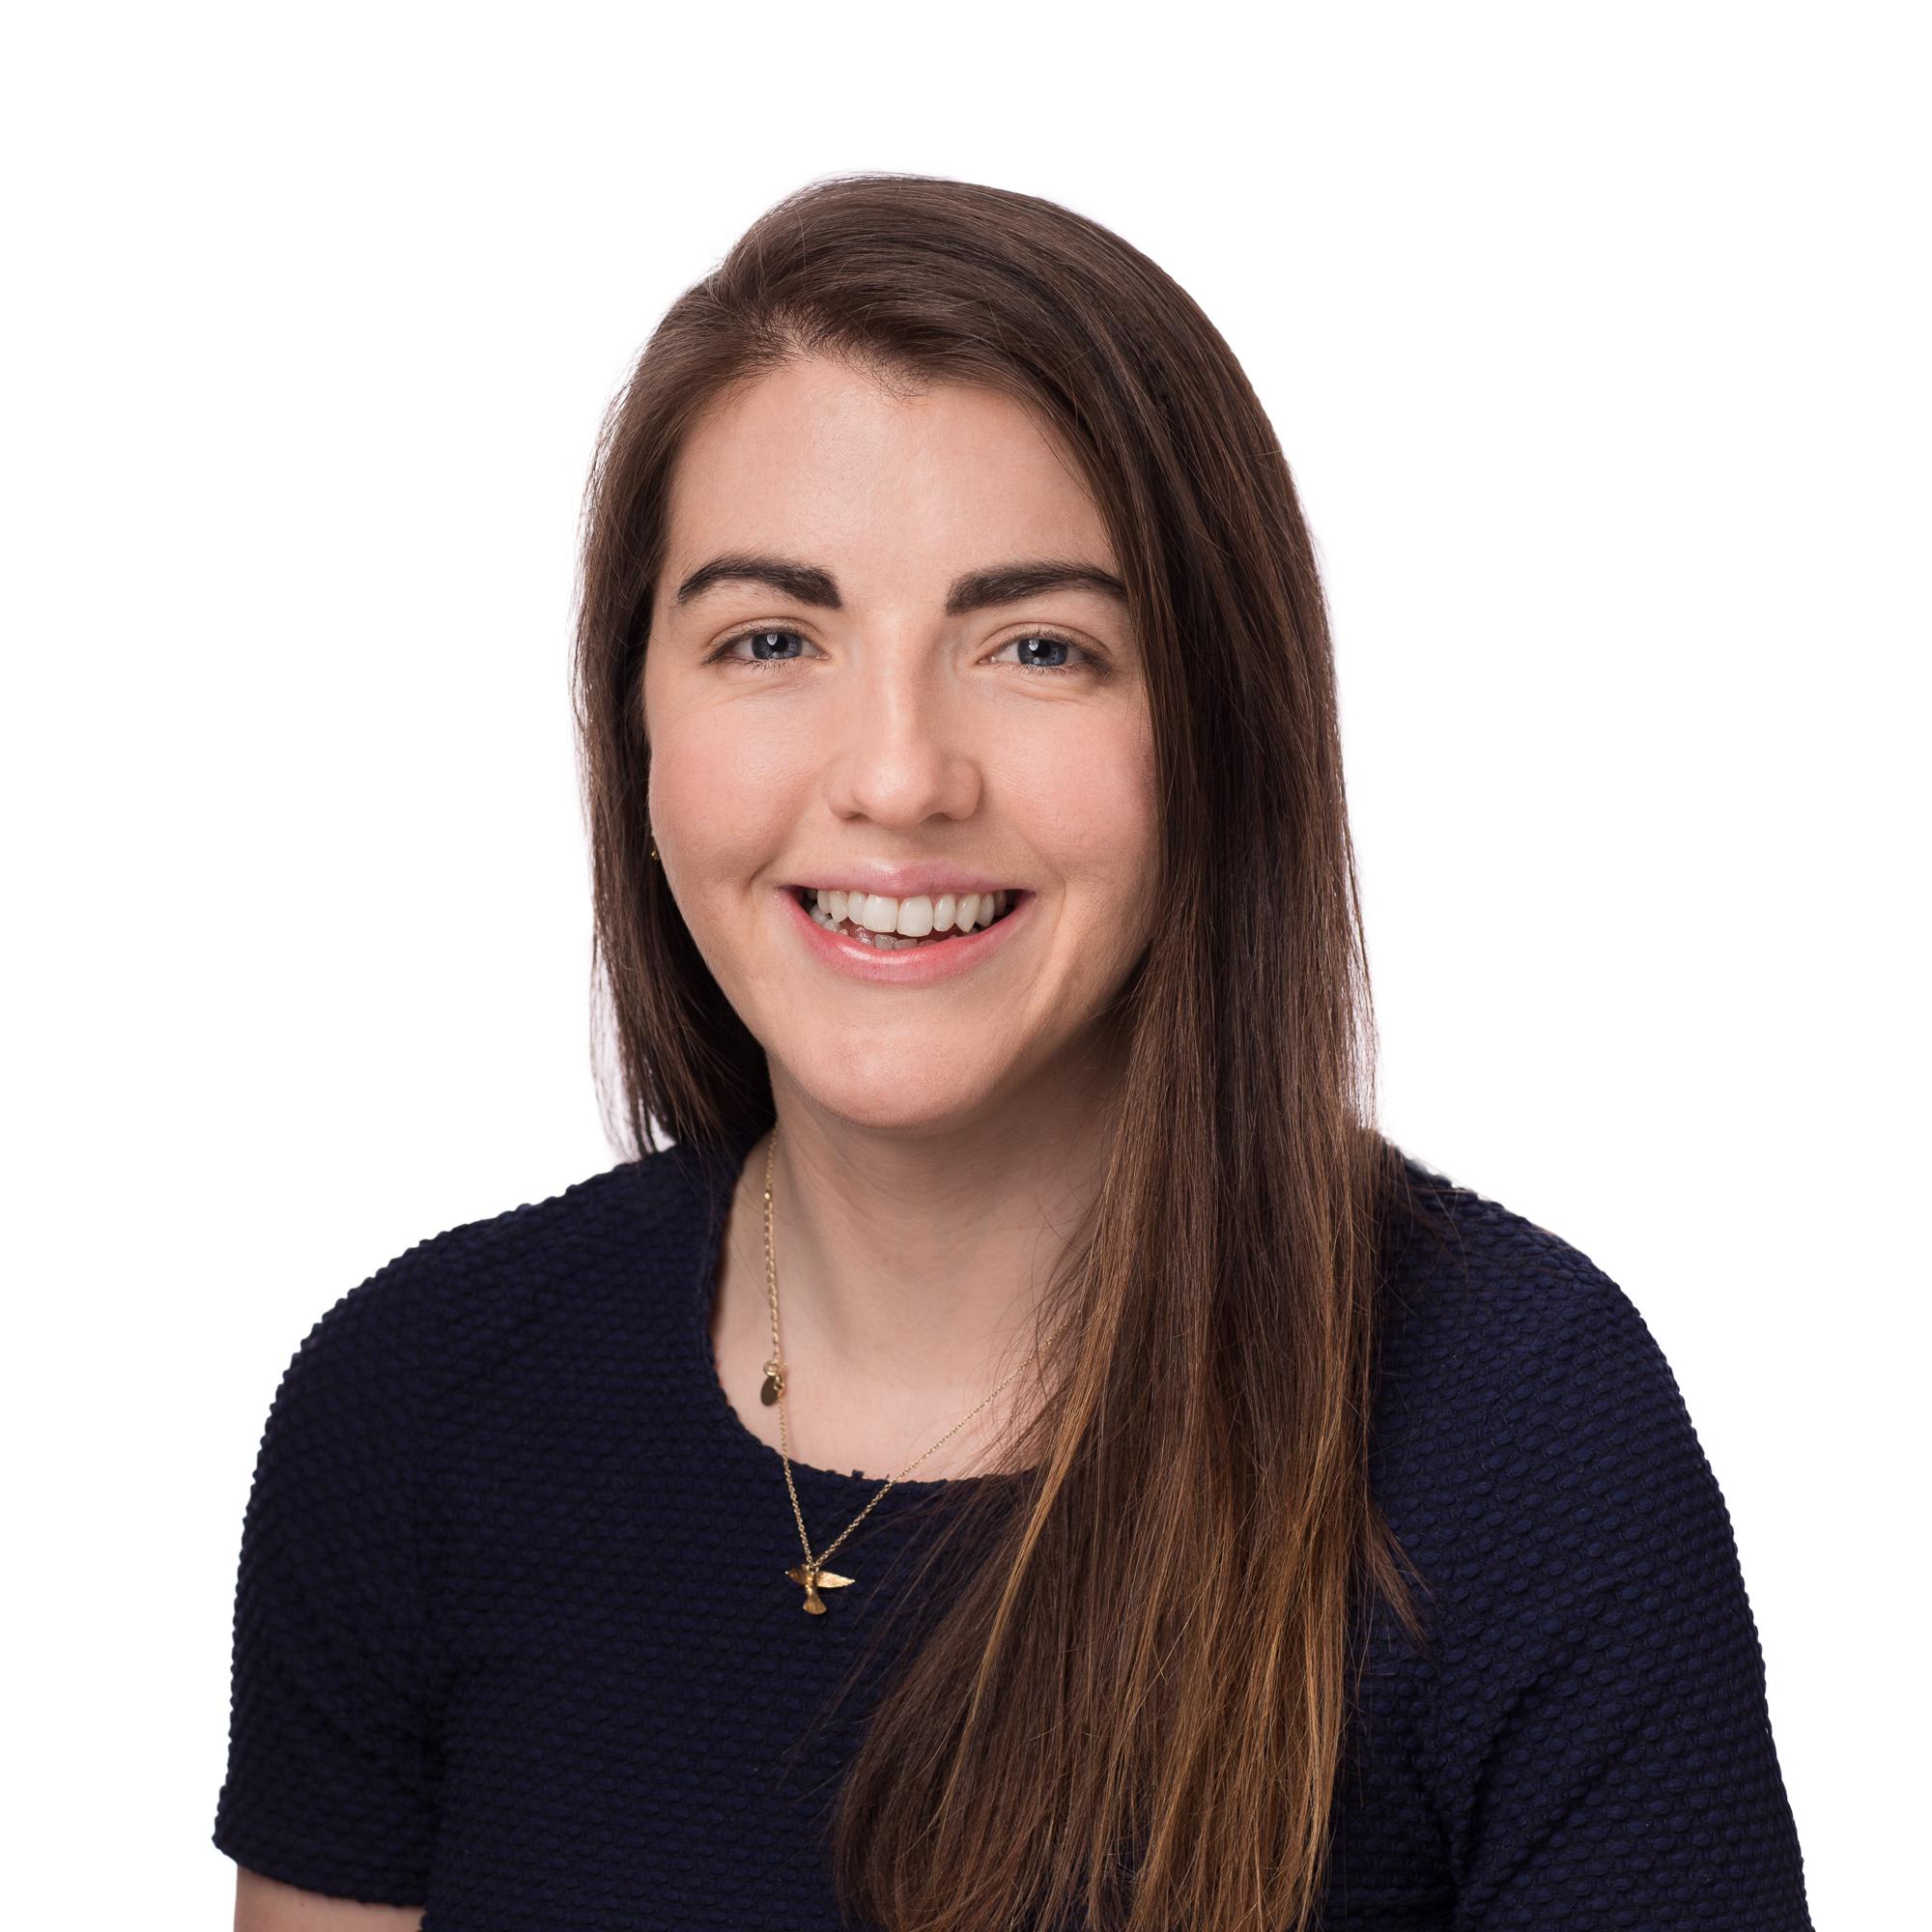 Martina Boyle - Senior Speech & Language Therapist